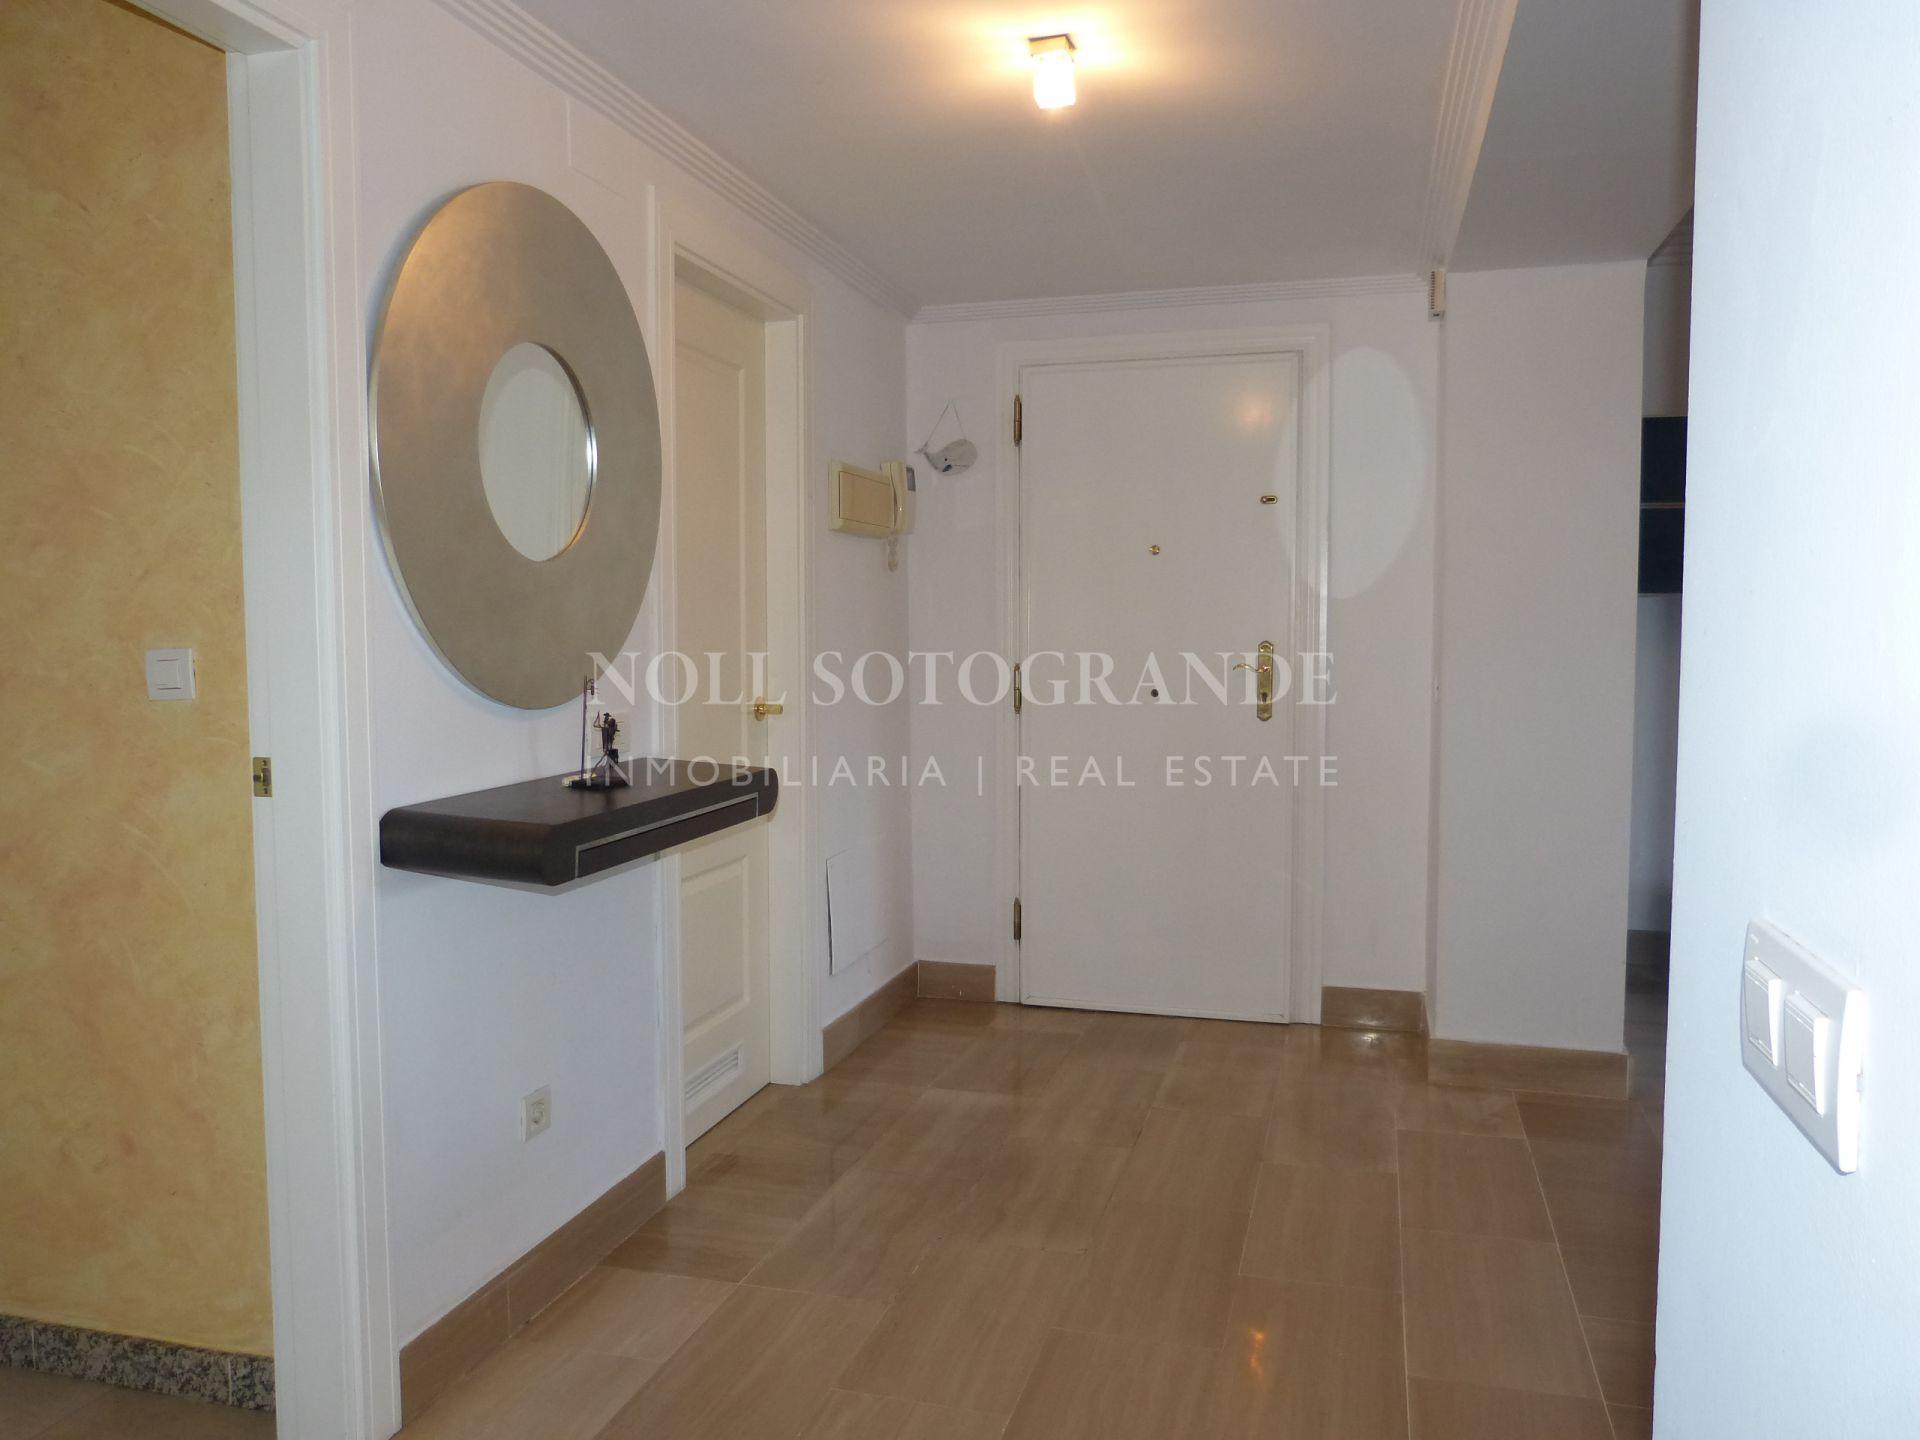 Apartment for rent in Los Gazules, Sotogrande Alto